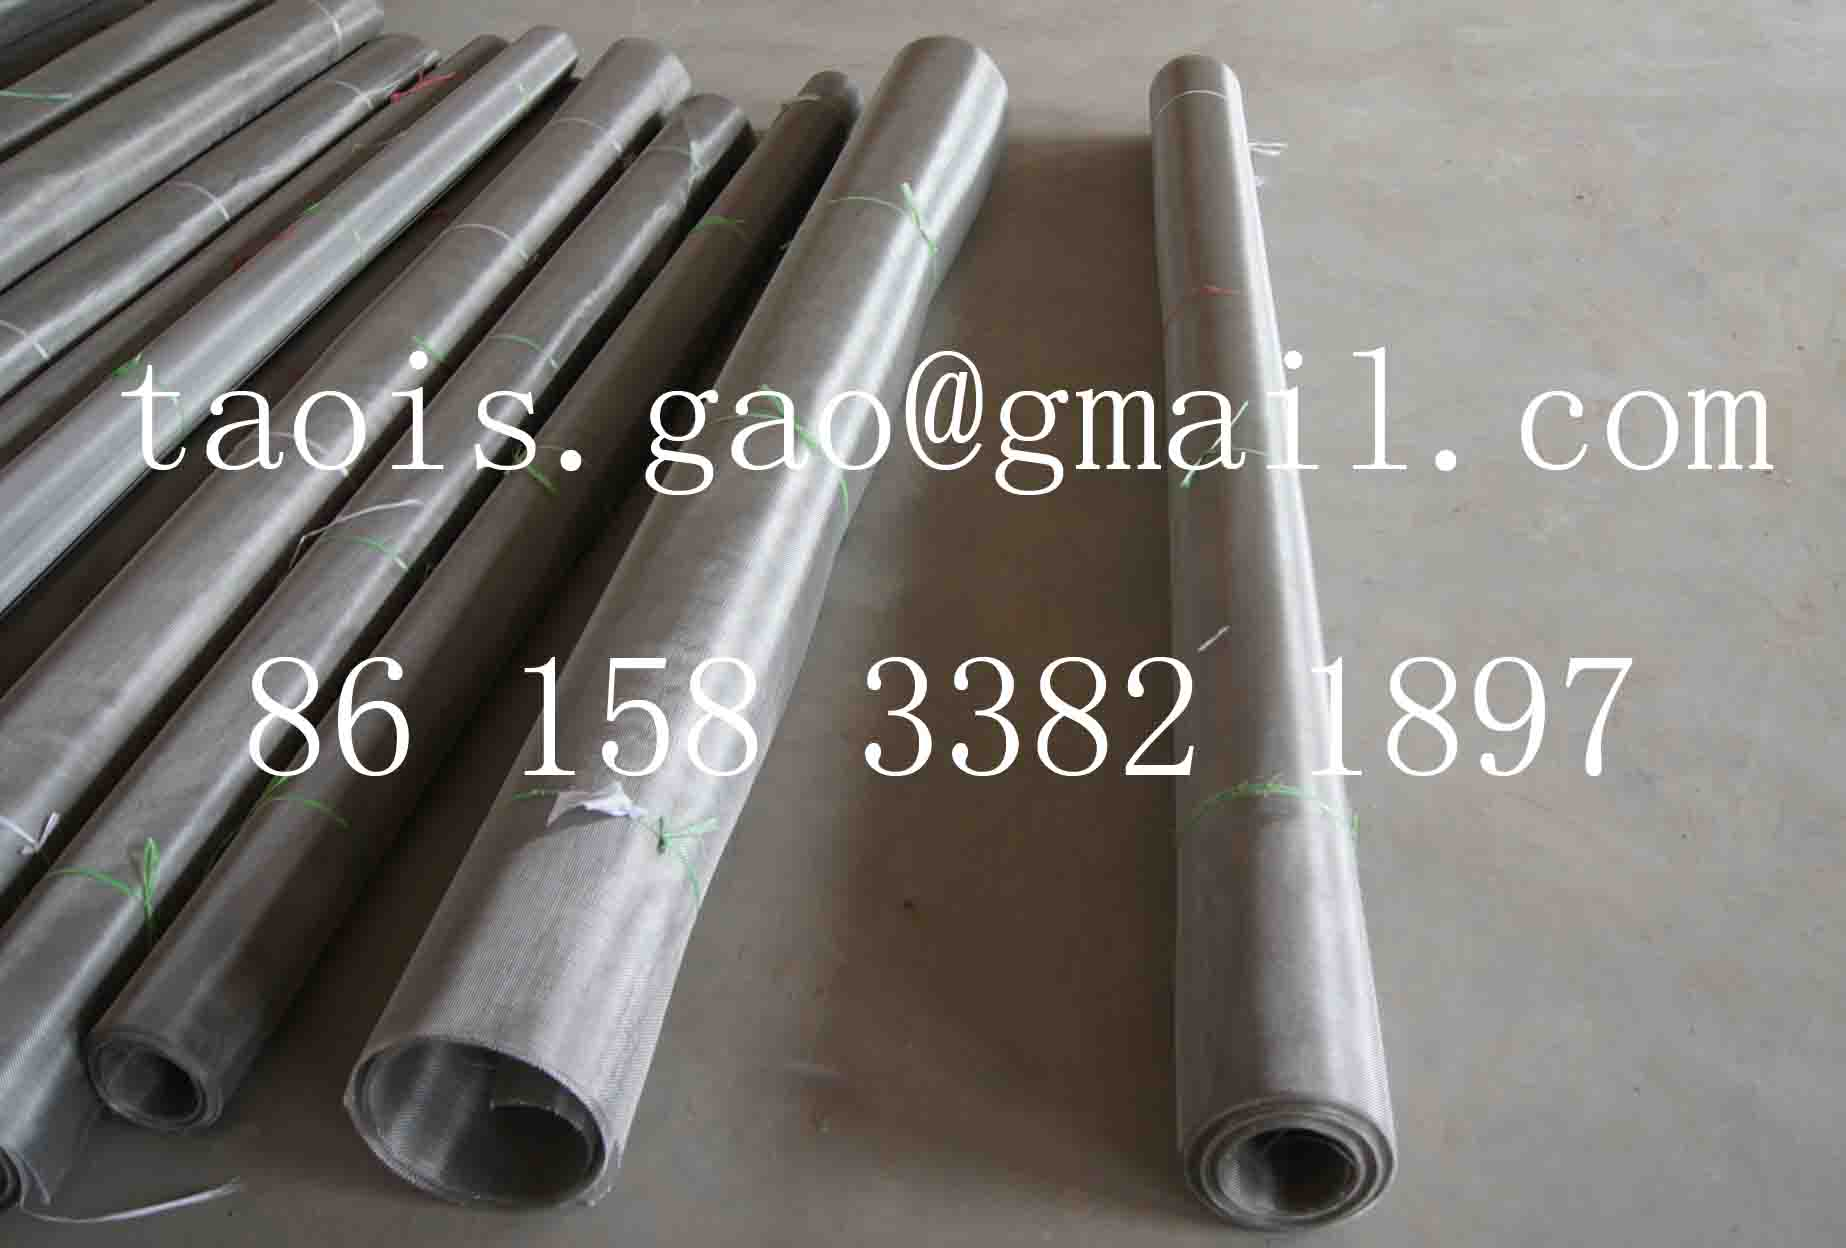 Ss 304 1mm roestvrij staal gaas, 10 x 10  18 x 18 staal gaas ...